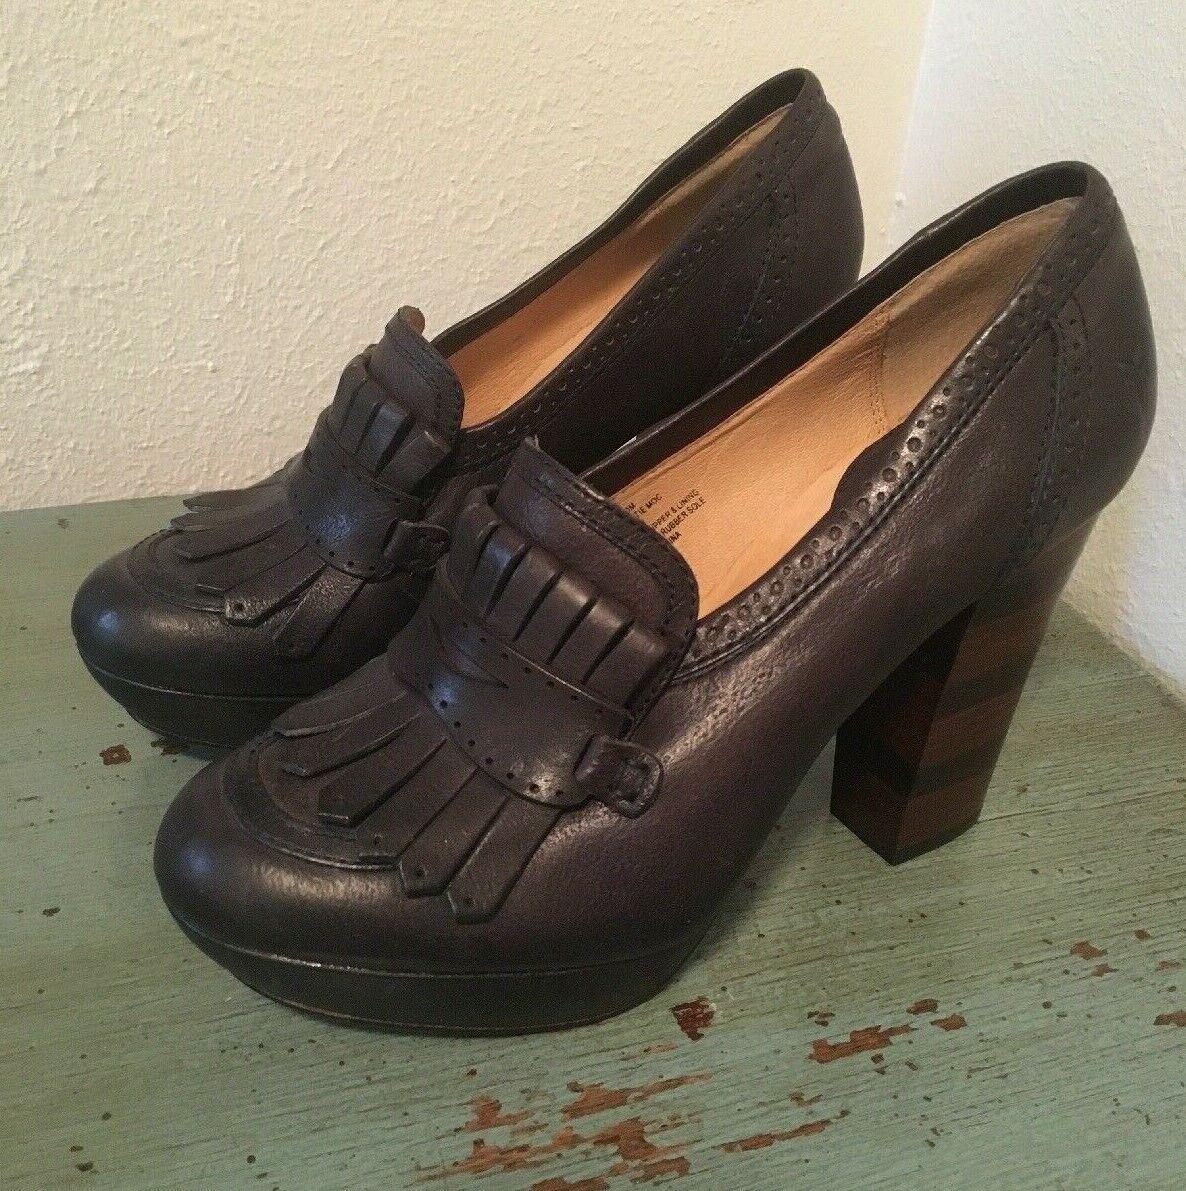 FRYE Size 10M Naiya Kiltie Moc Black Pumps Stacked Leather Heels shoes